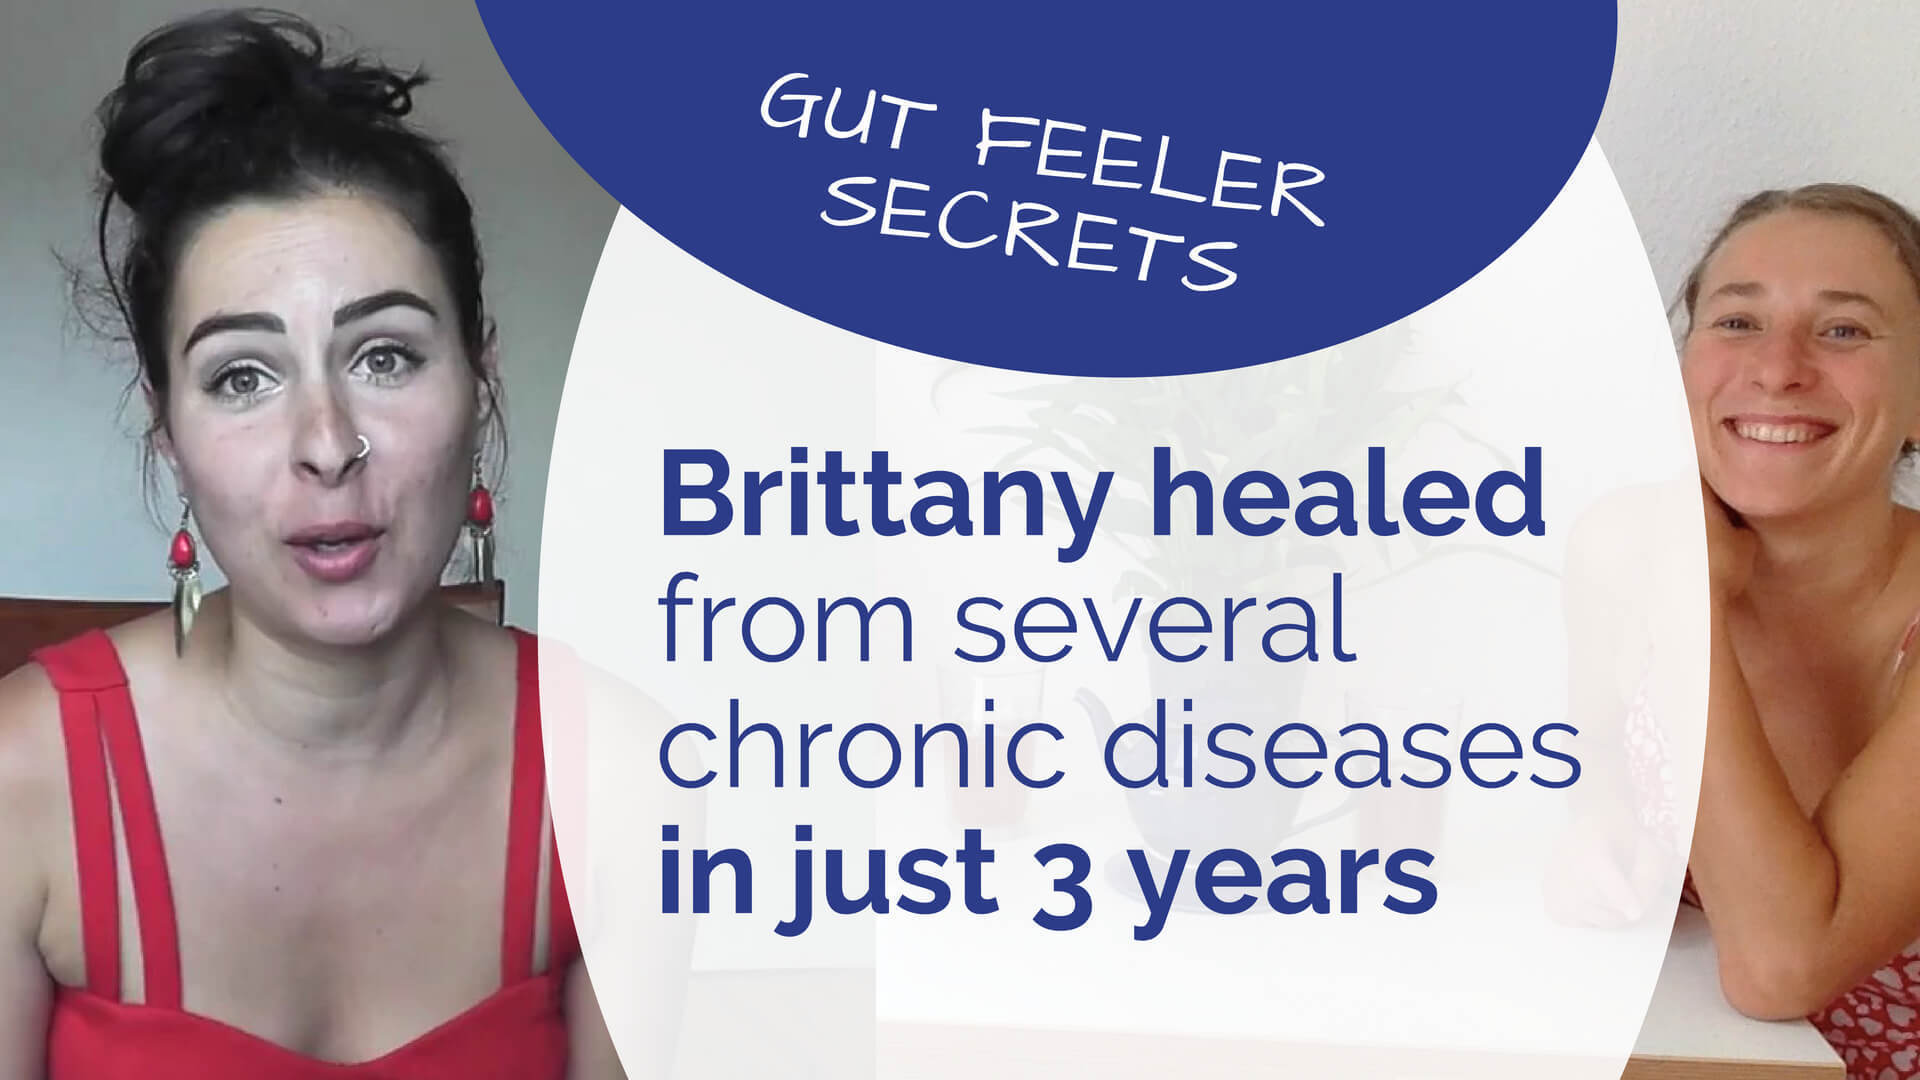 Gut Feelers Share, Montreal Healthy Girl Chronic Illness, Gut Feelings.jpg